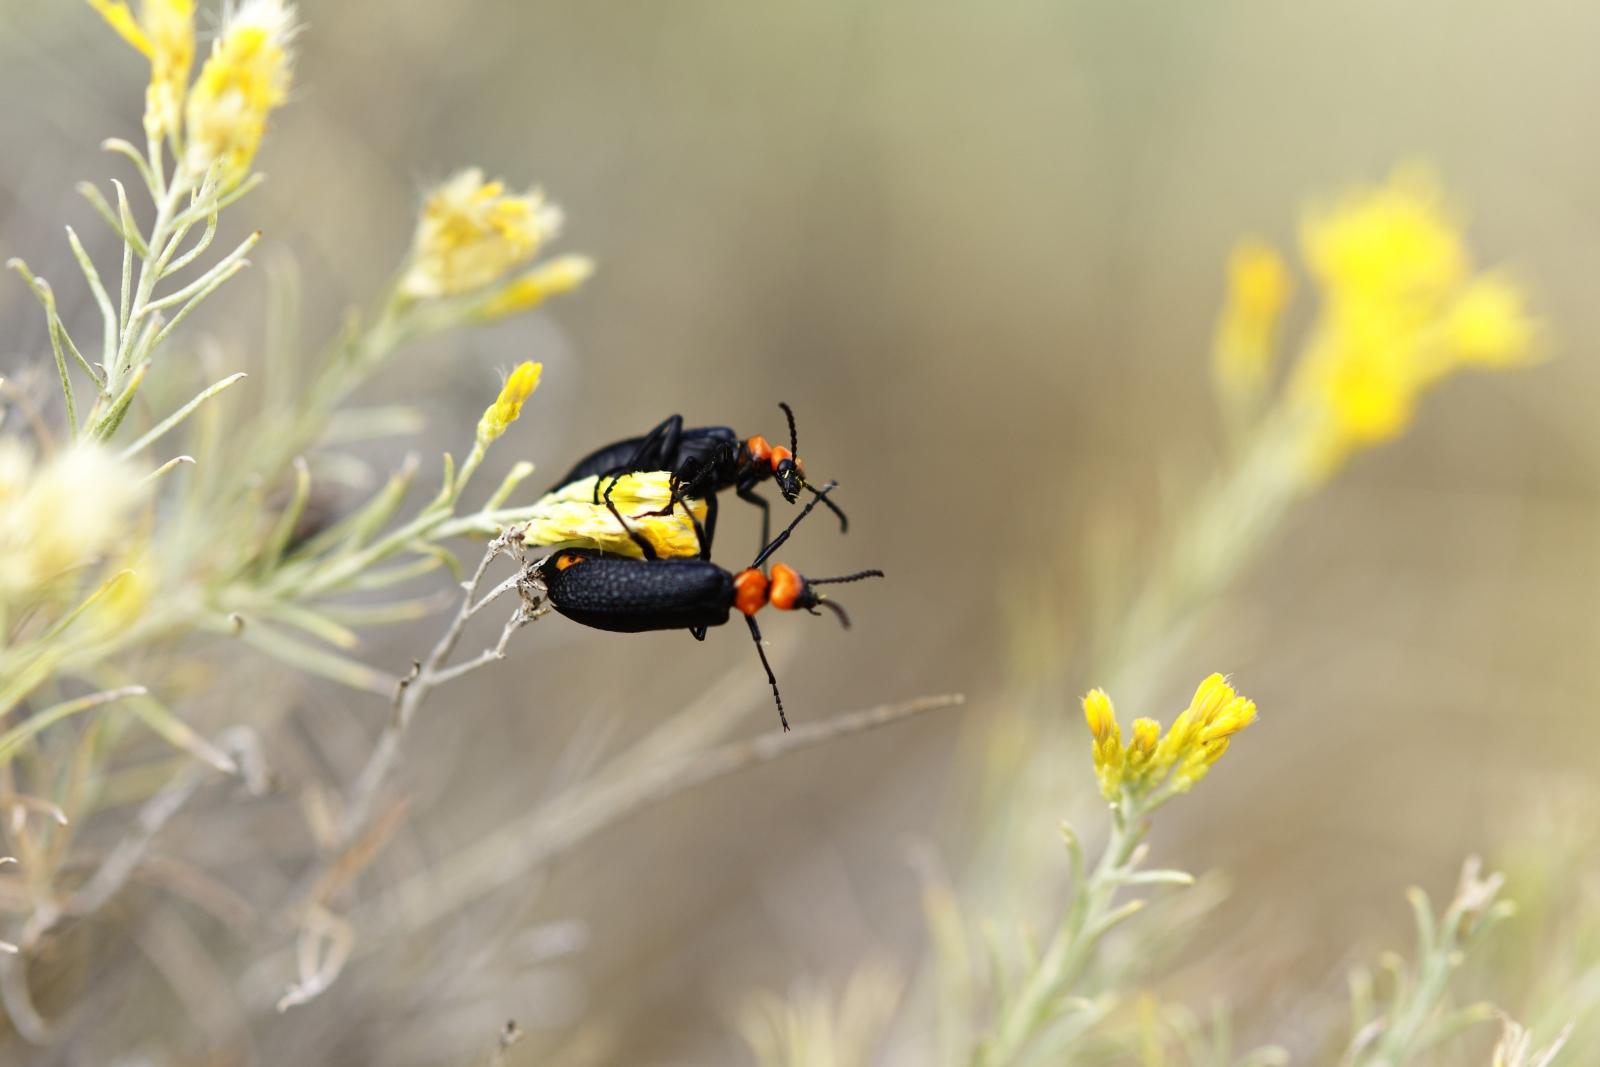 Soldier beetles in the desert of Eastern Washington.